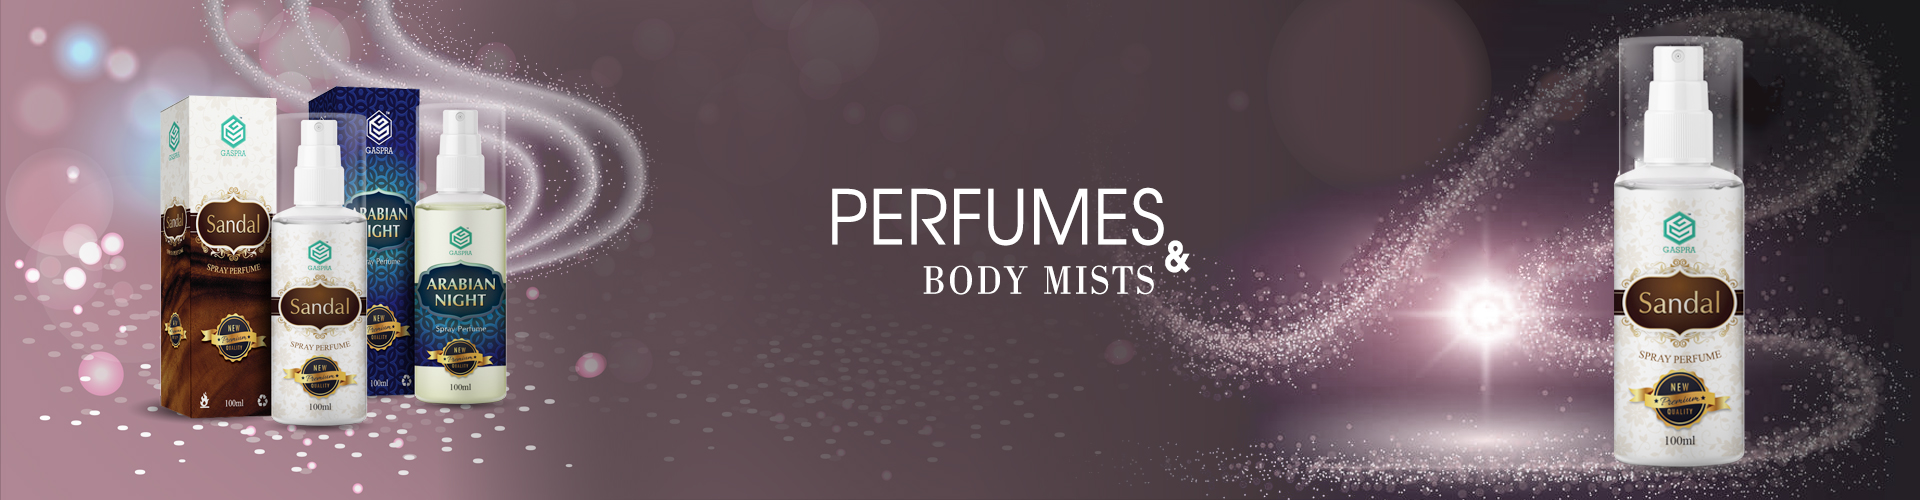 Perfumes & Body mists